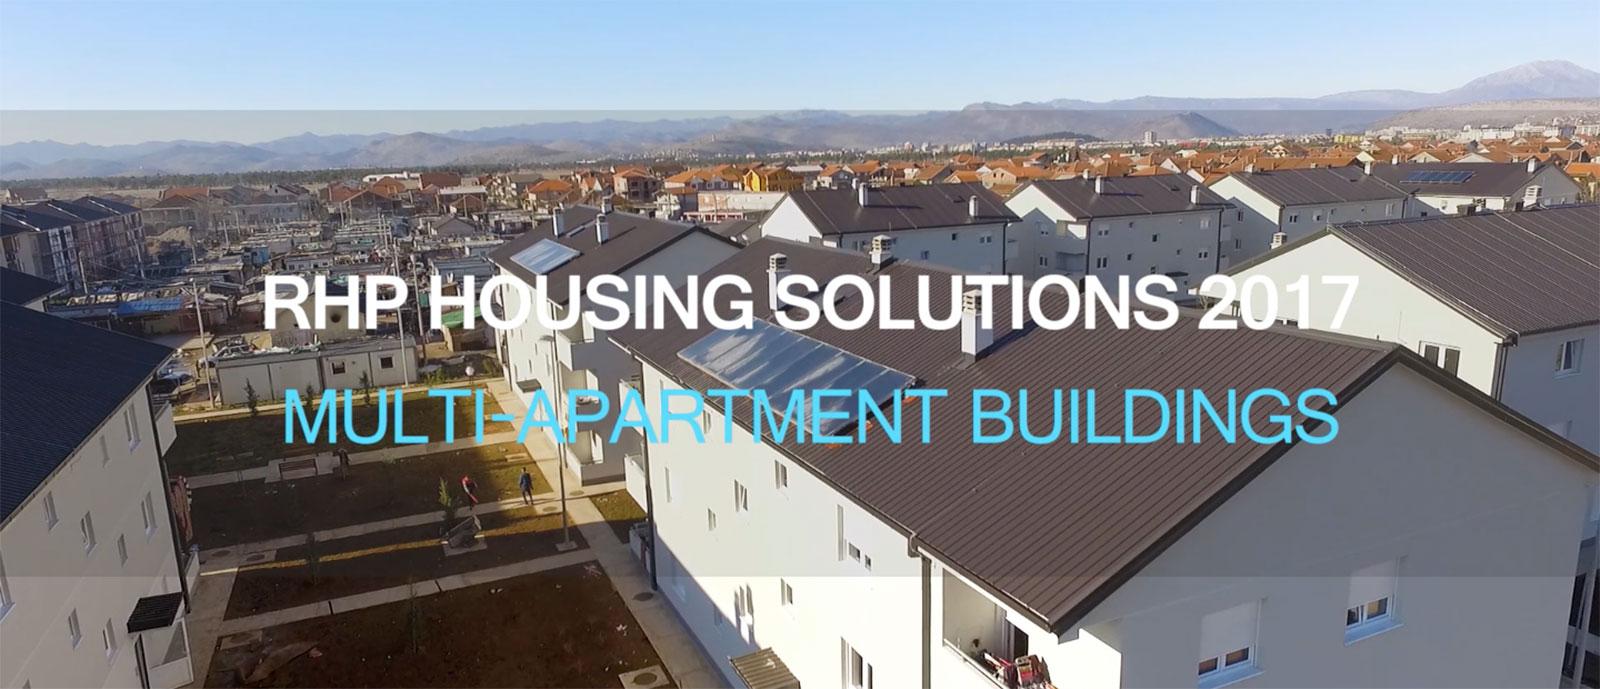 RHP-Multi-apartment-Buildings-2017-slide